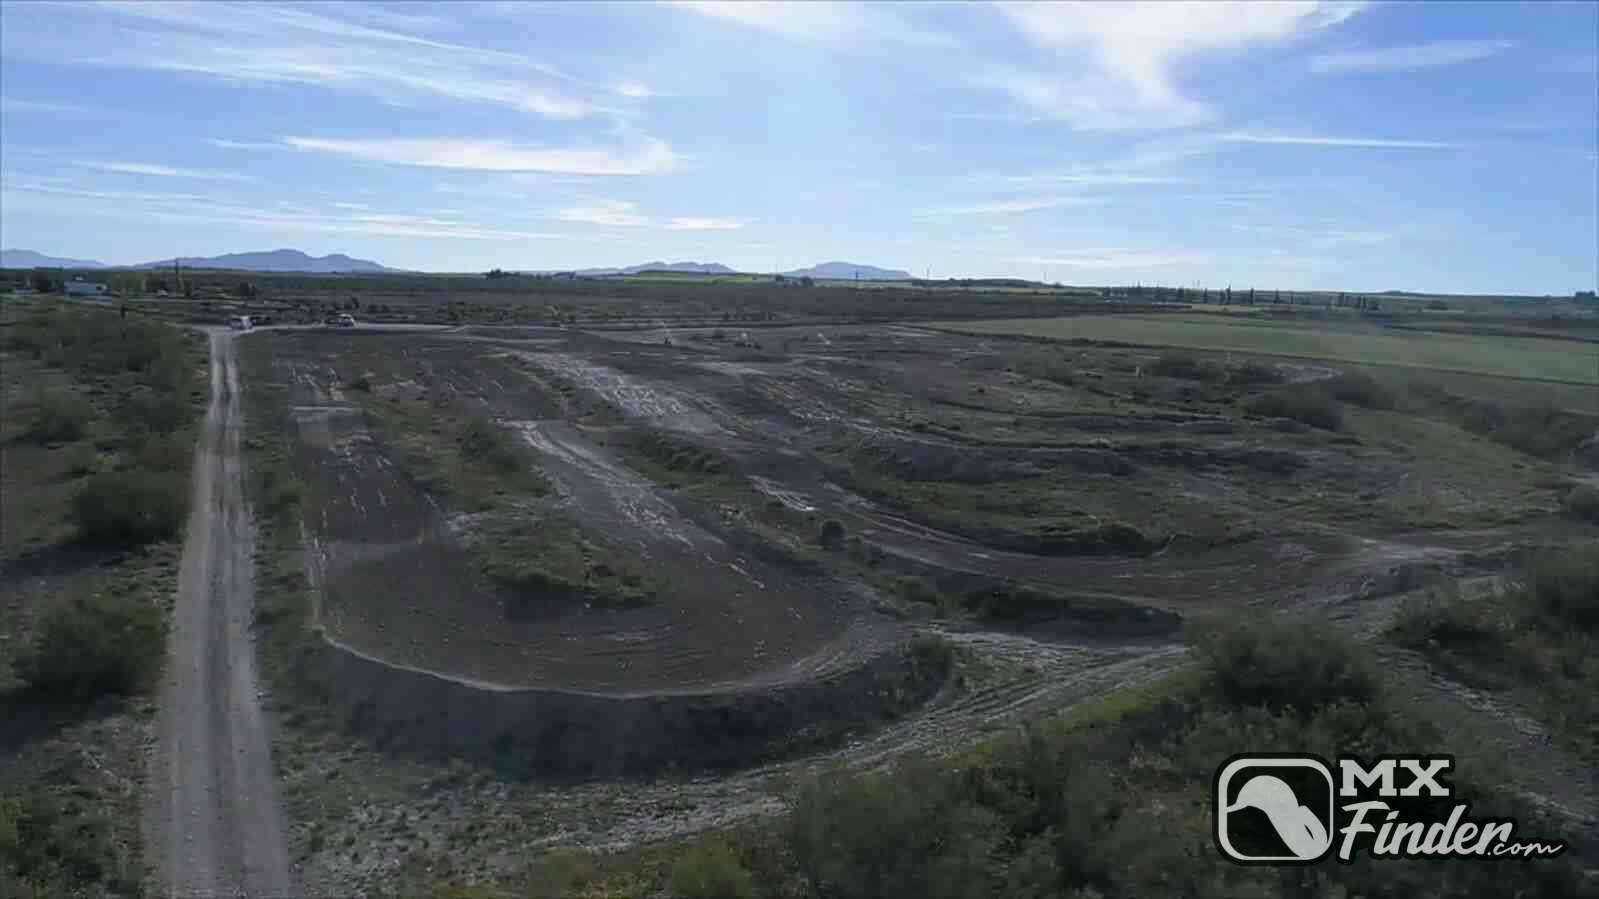 motocross, Los Albardinales, Caniles, motocross track